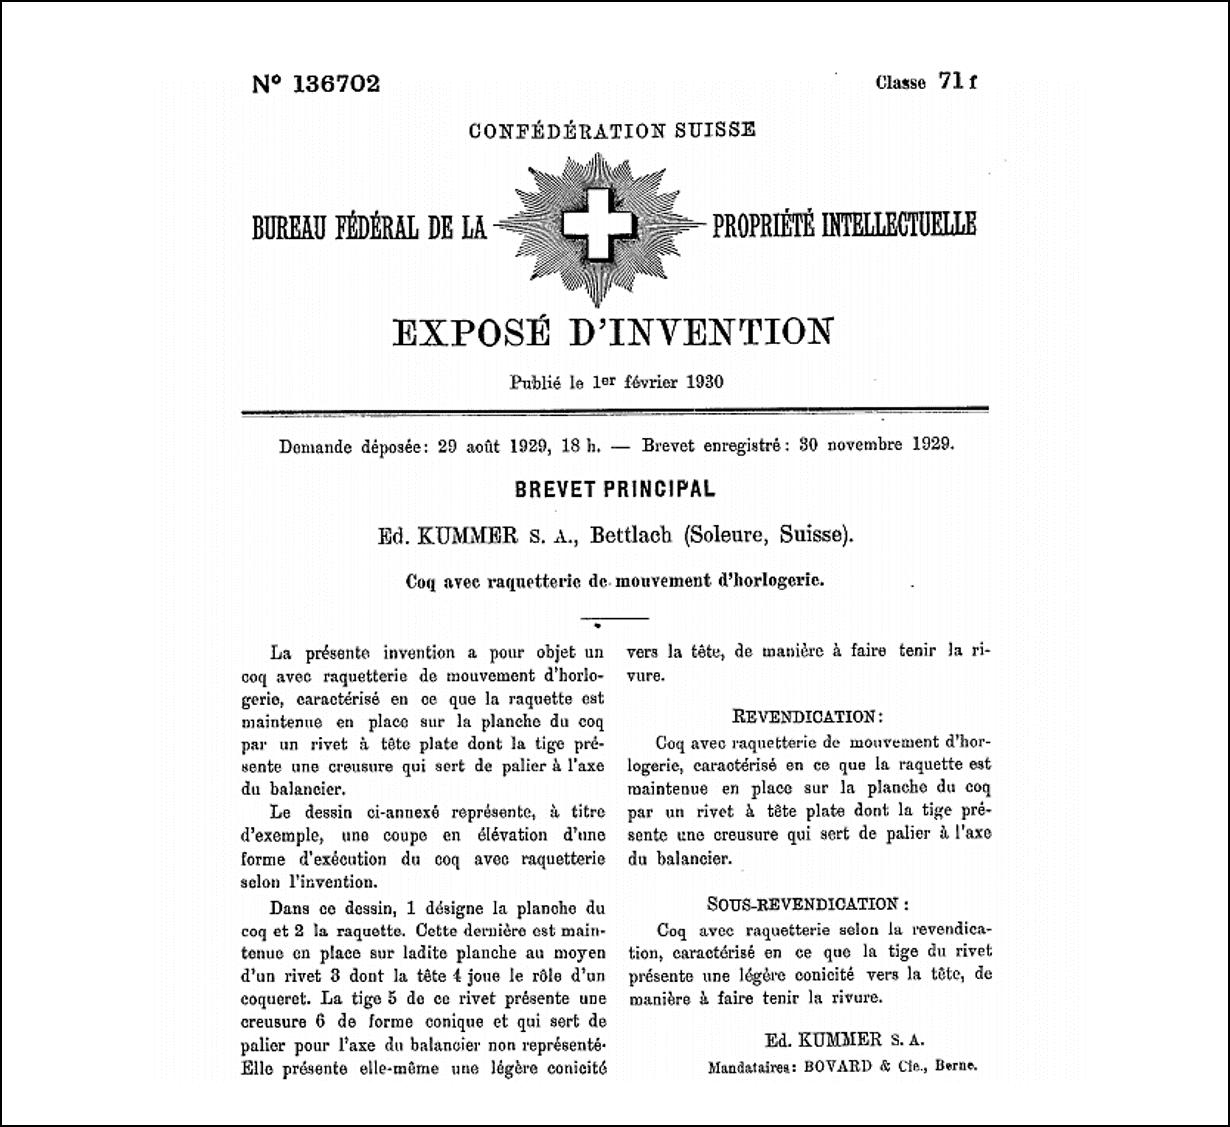 Pat.136701.Patent.S1.png